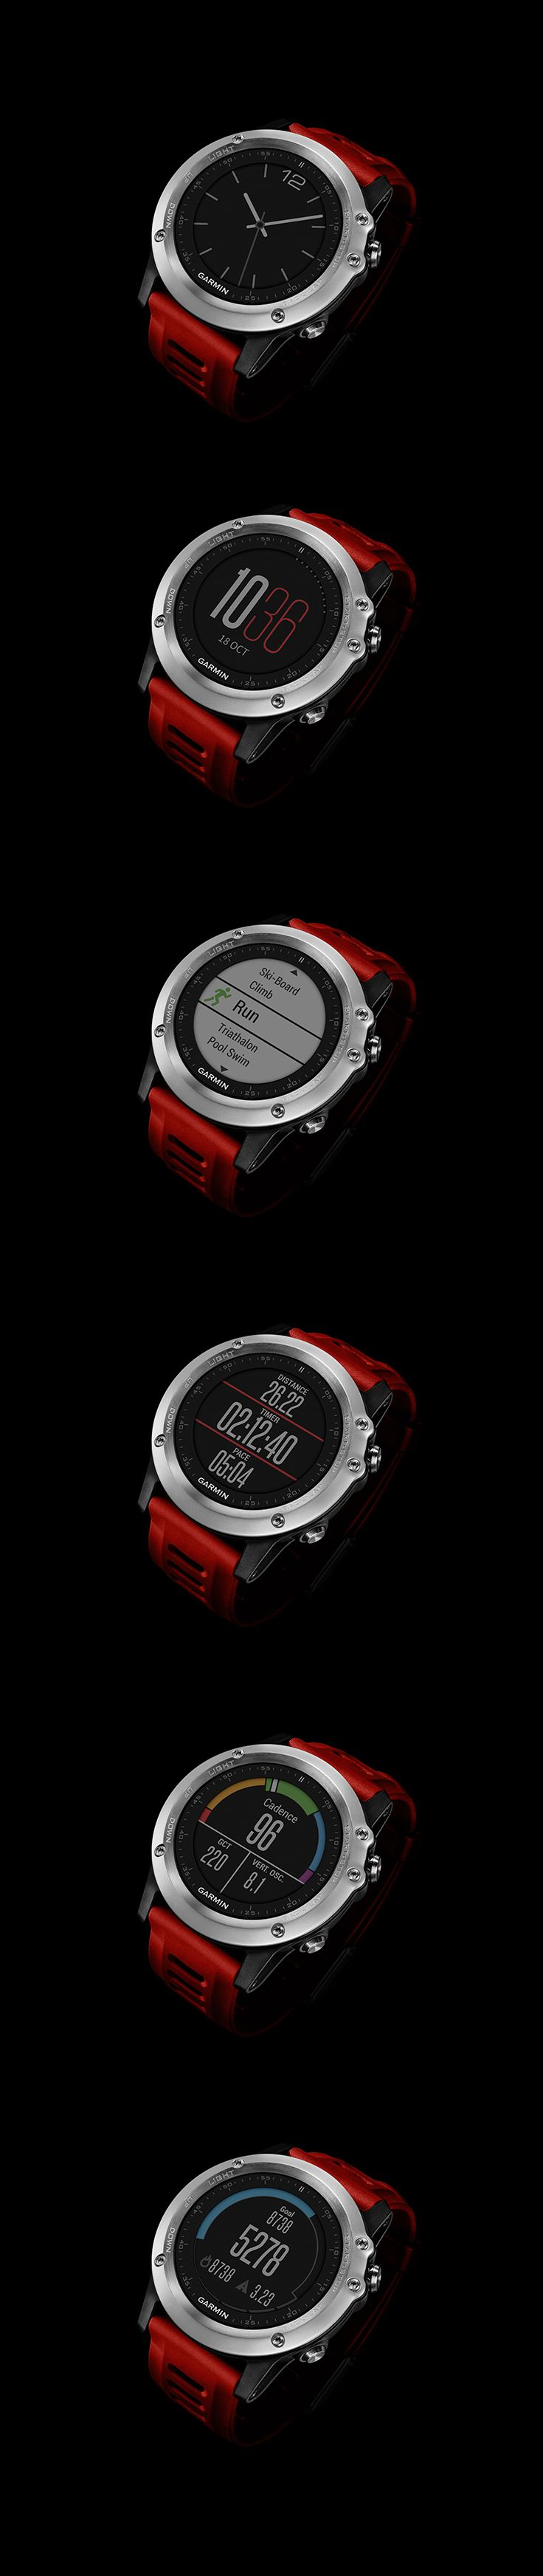 World's first adventure sport training Garmin GPS/GLONASS watch. #Fenix3 fenix3.garmin.com/en-US